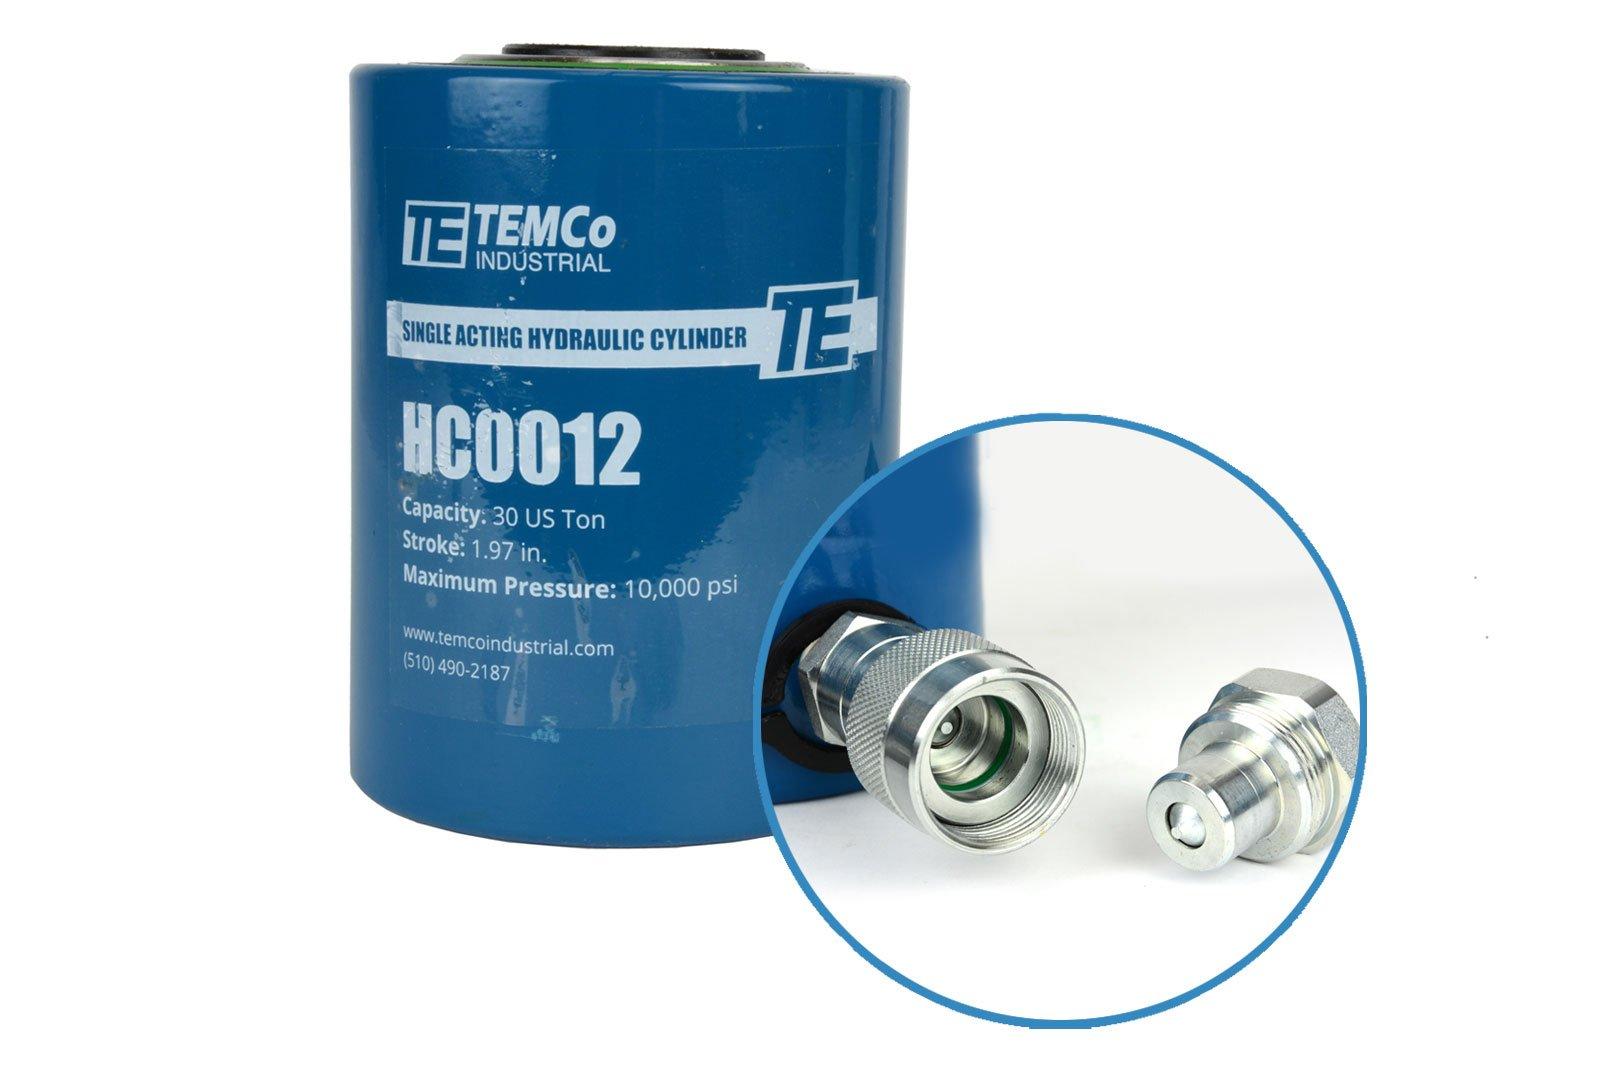 TEMCo HC0012 - Hydraulic Cylinder Ram Single Acting 30 TON 2'' Inch Stroke - 5 Year Warranty